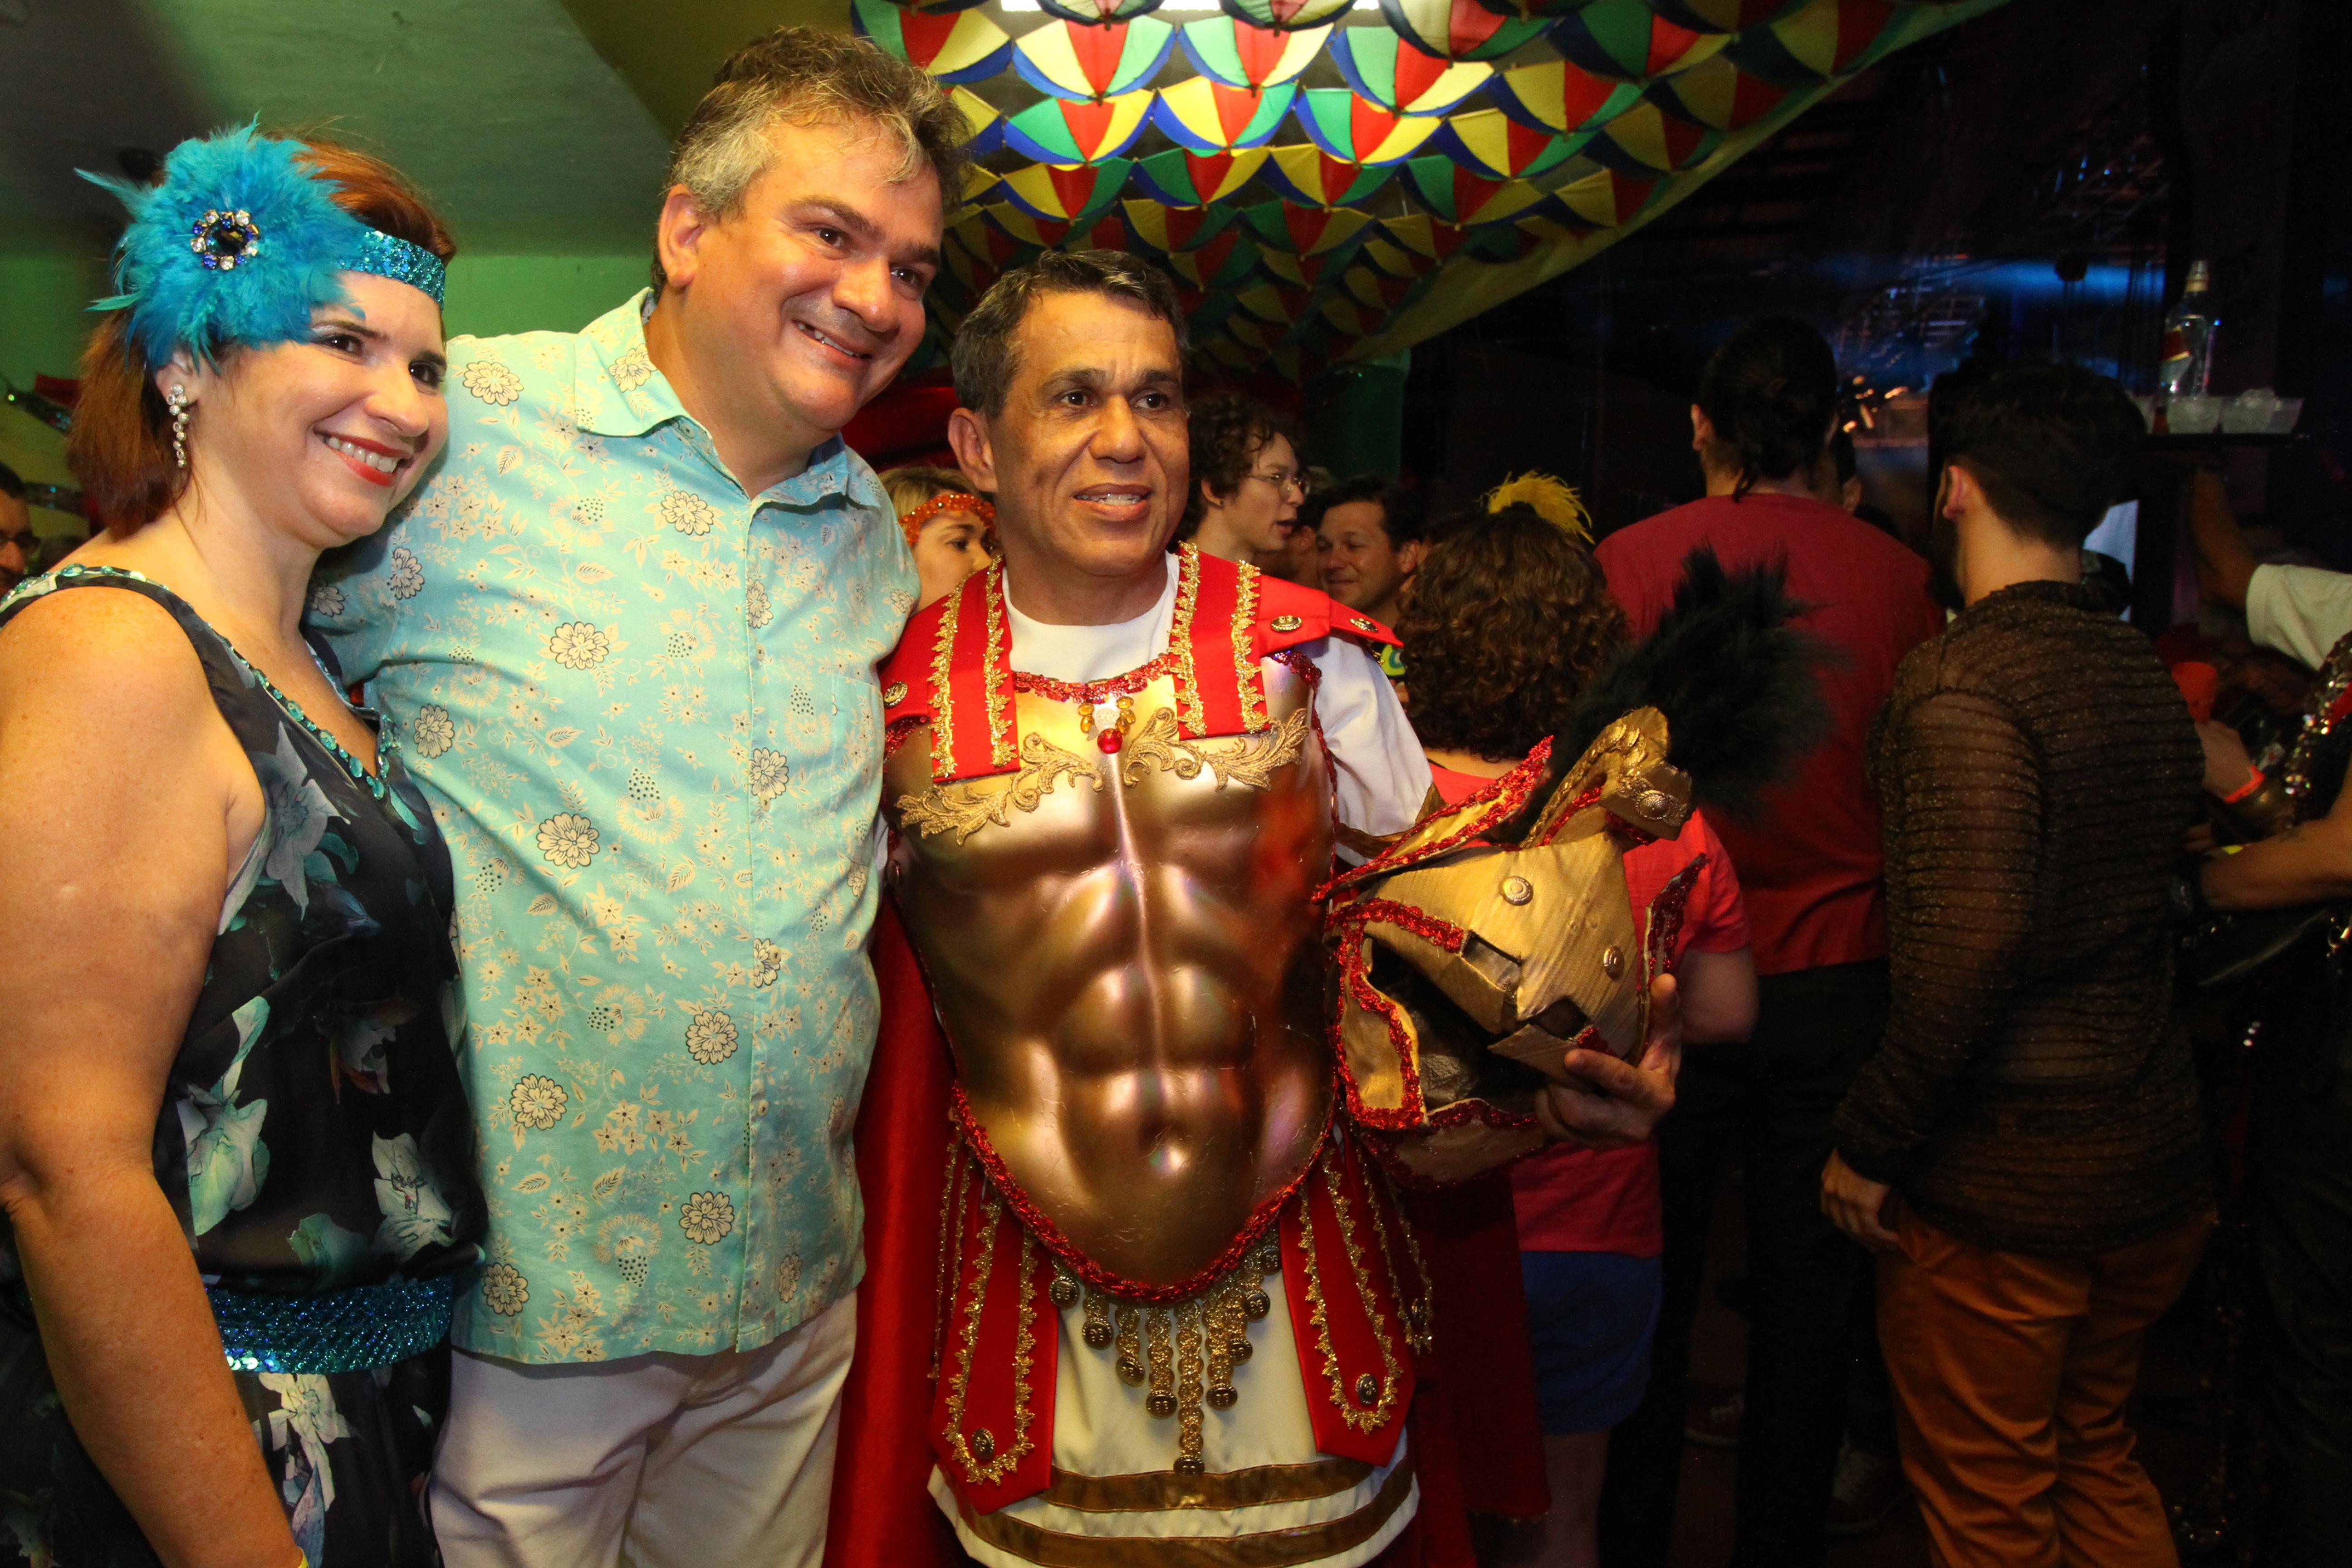 Ana Paula, Augusto Carreras e Zezo - Crédito: Nando Chiappetta/DP